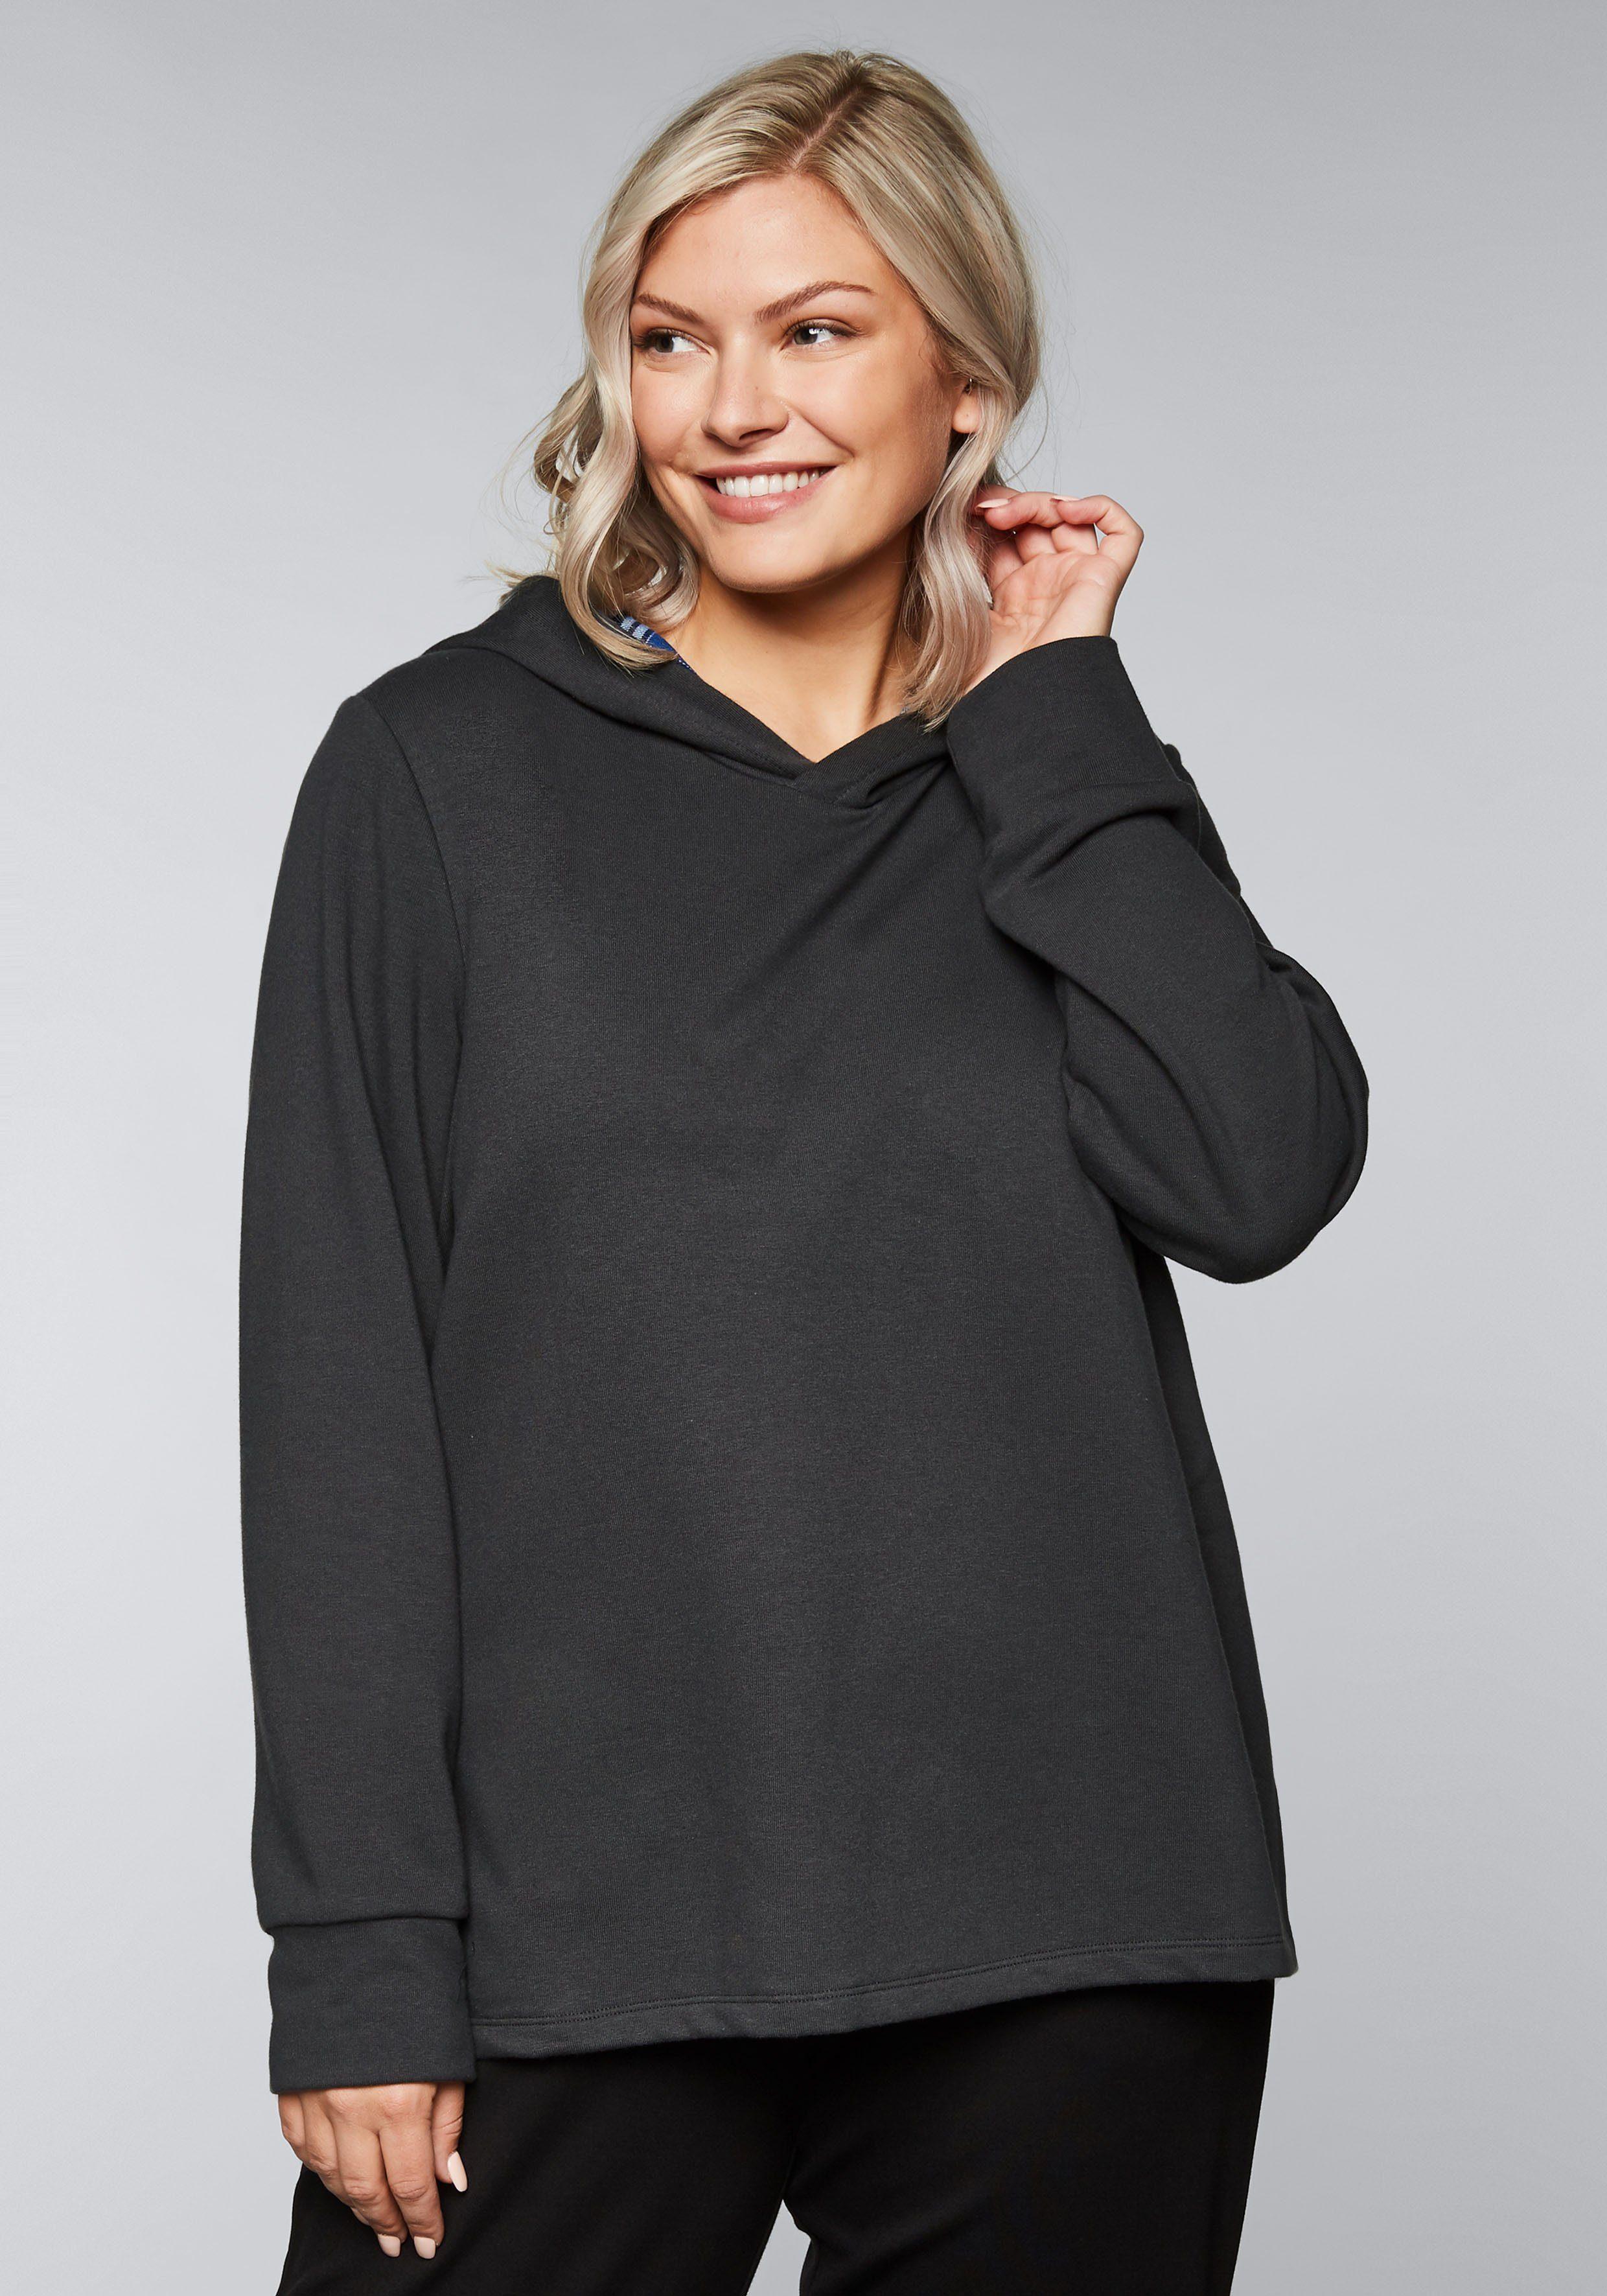 Innenfutter Mit Kontrastfarbigen Kaufen Kapuzensweatshirt Online Sheego rhxstdCBQ